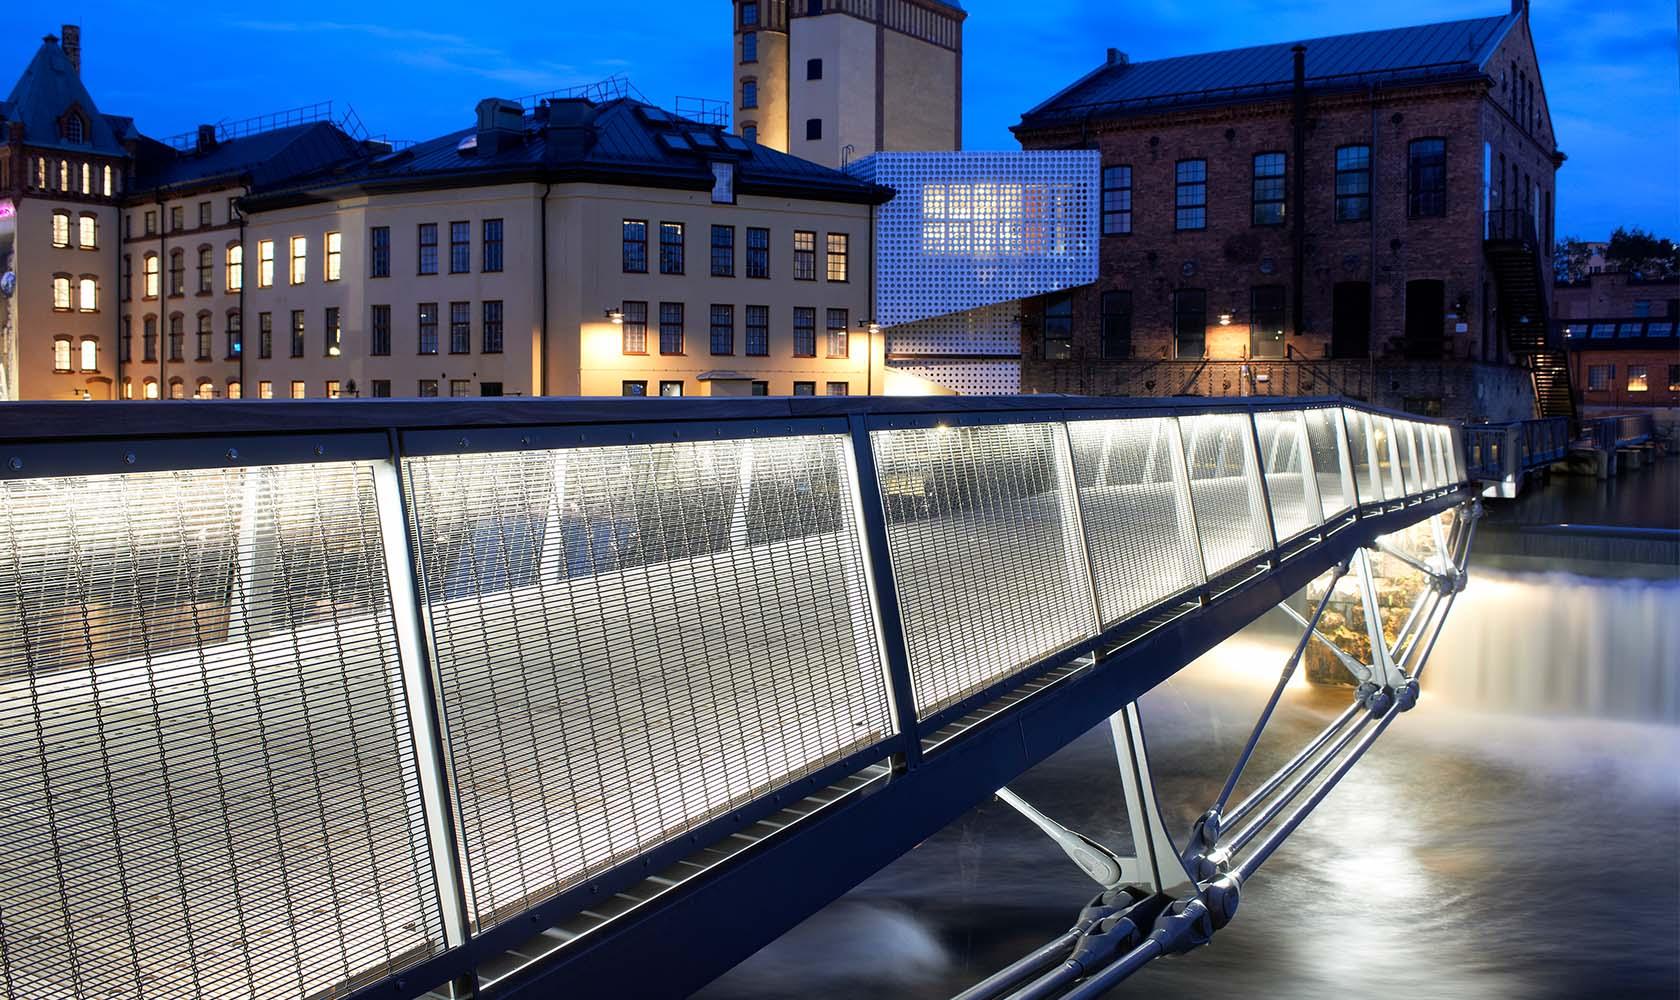 Upplyst Kåkenhusbron